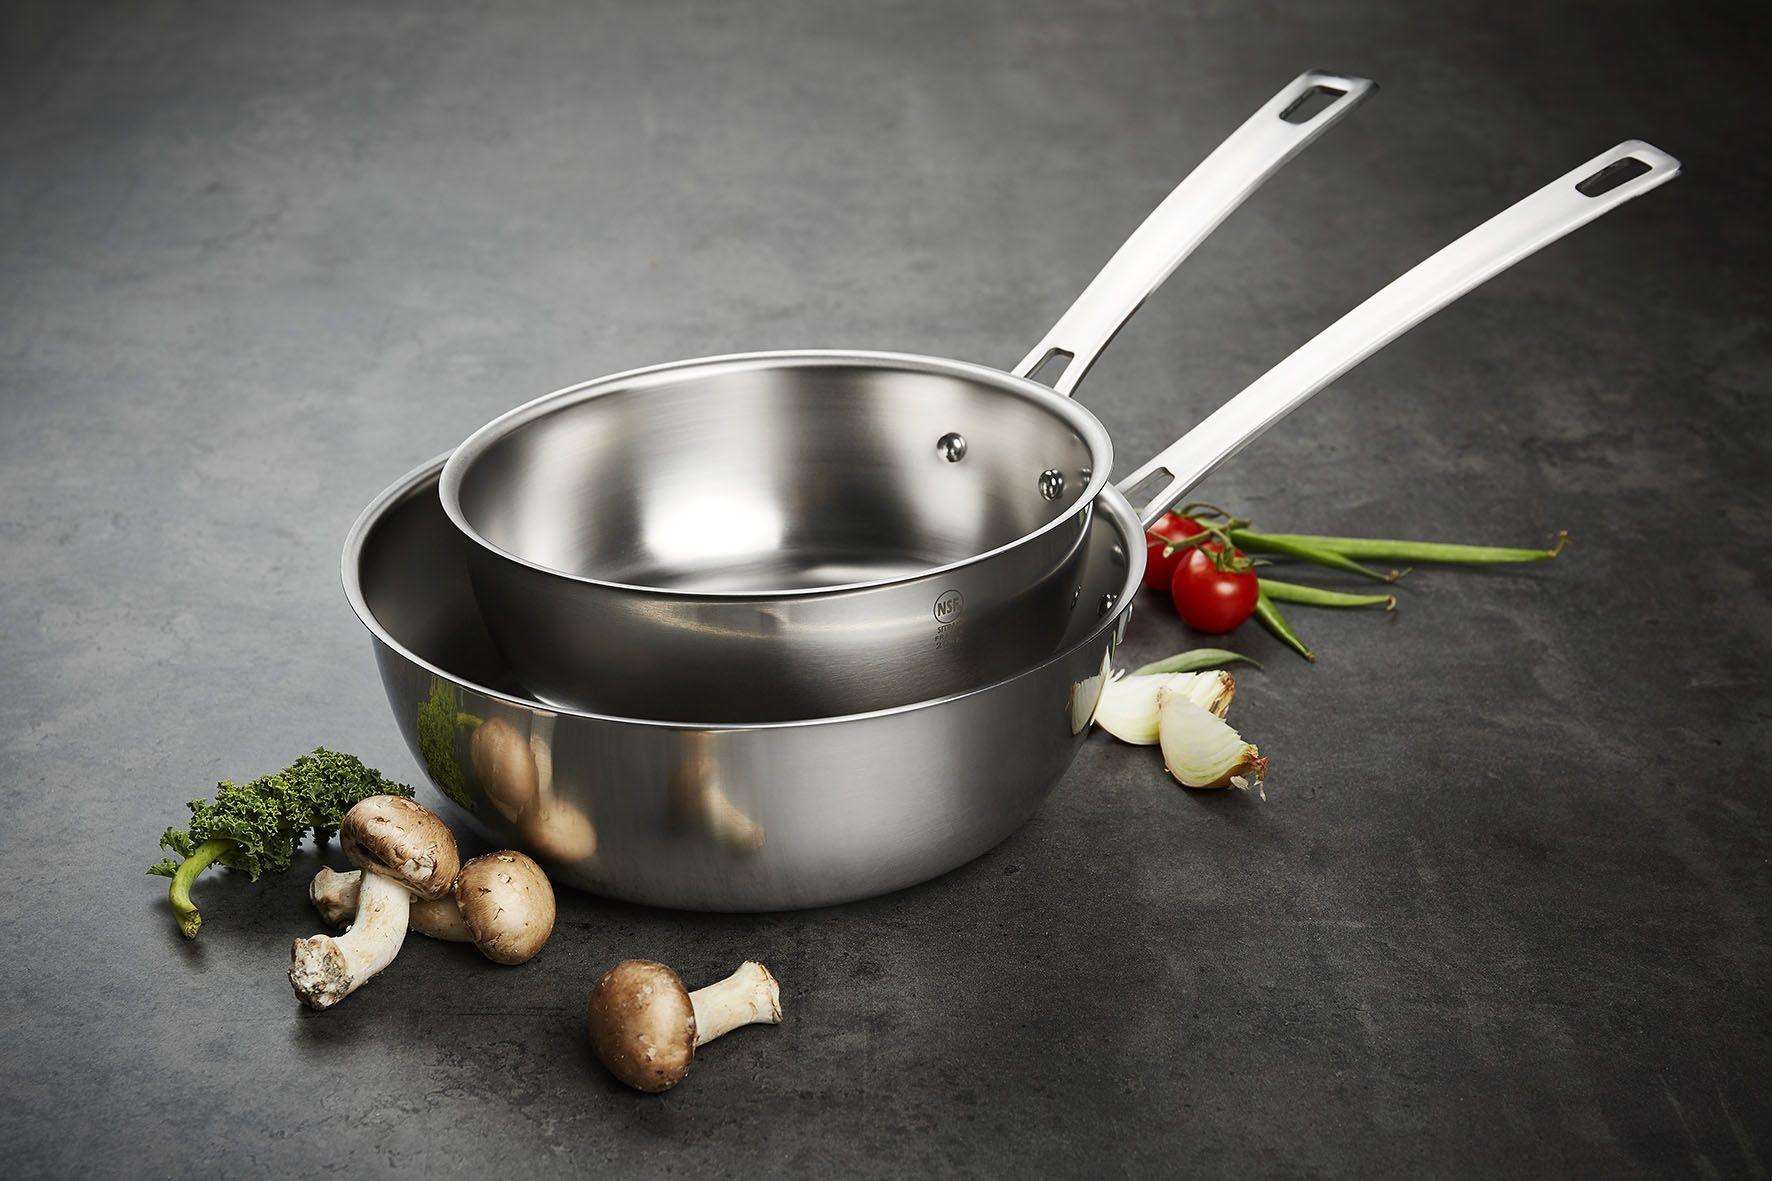 sauteuse_cookware